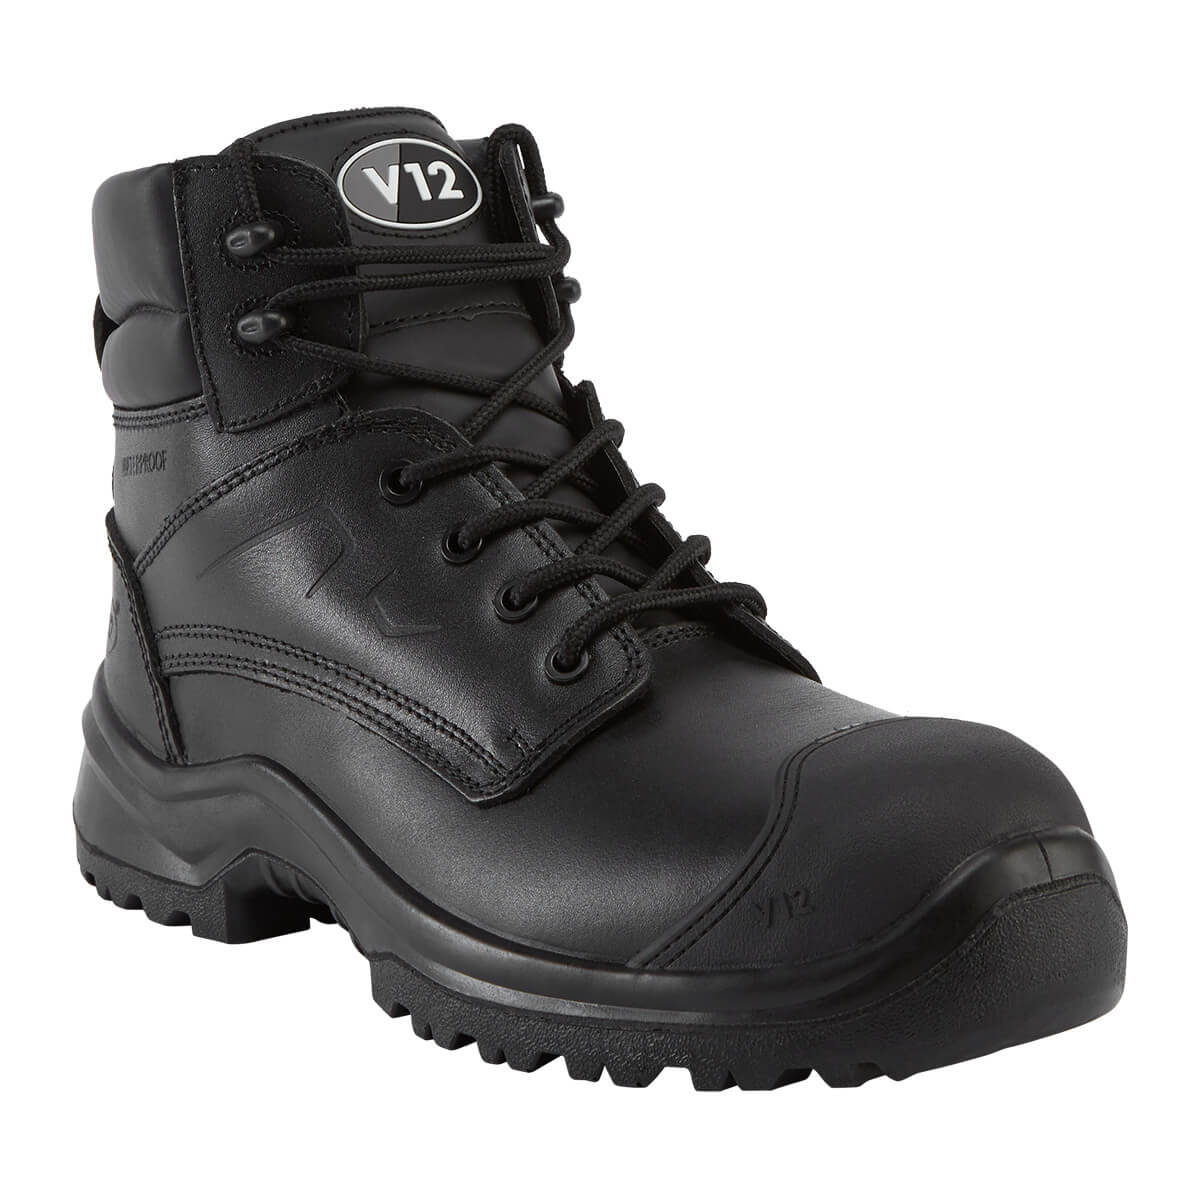 V12 Ibex Boot